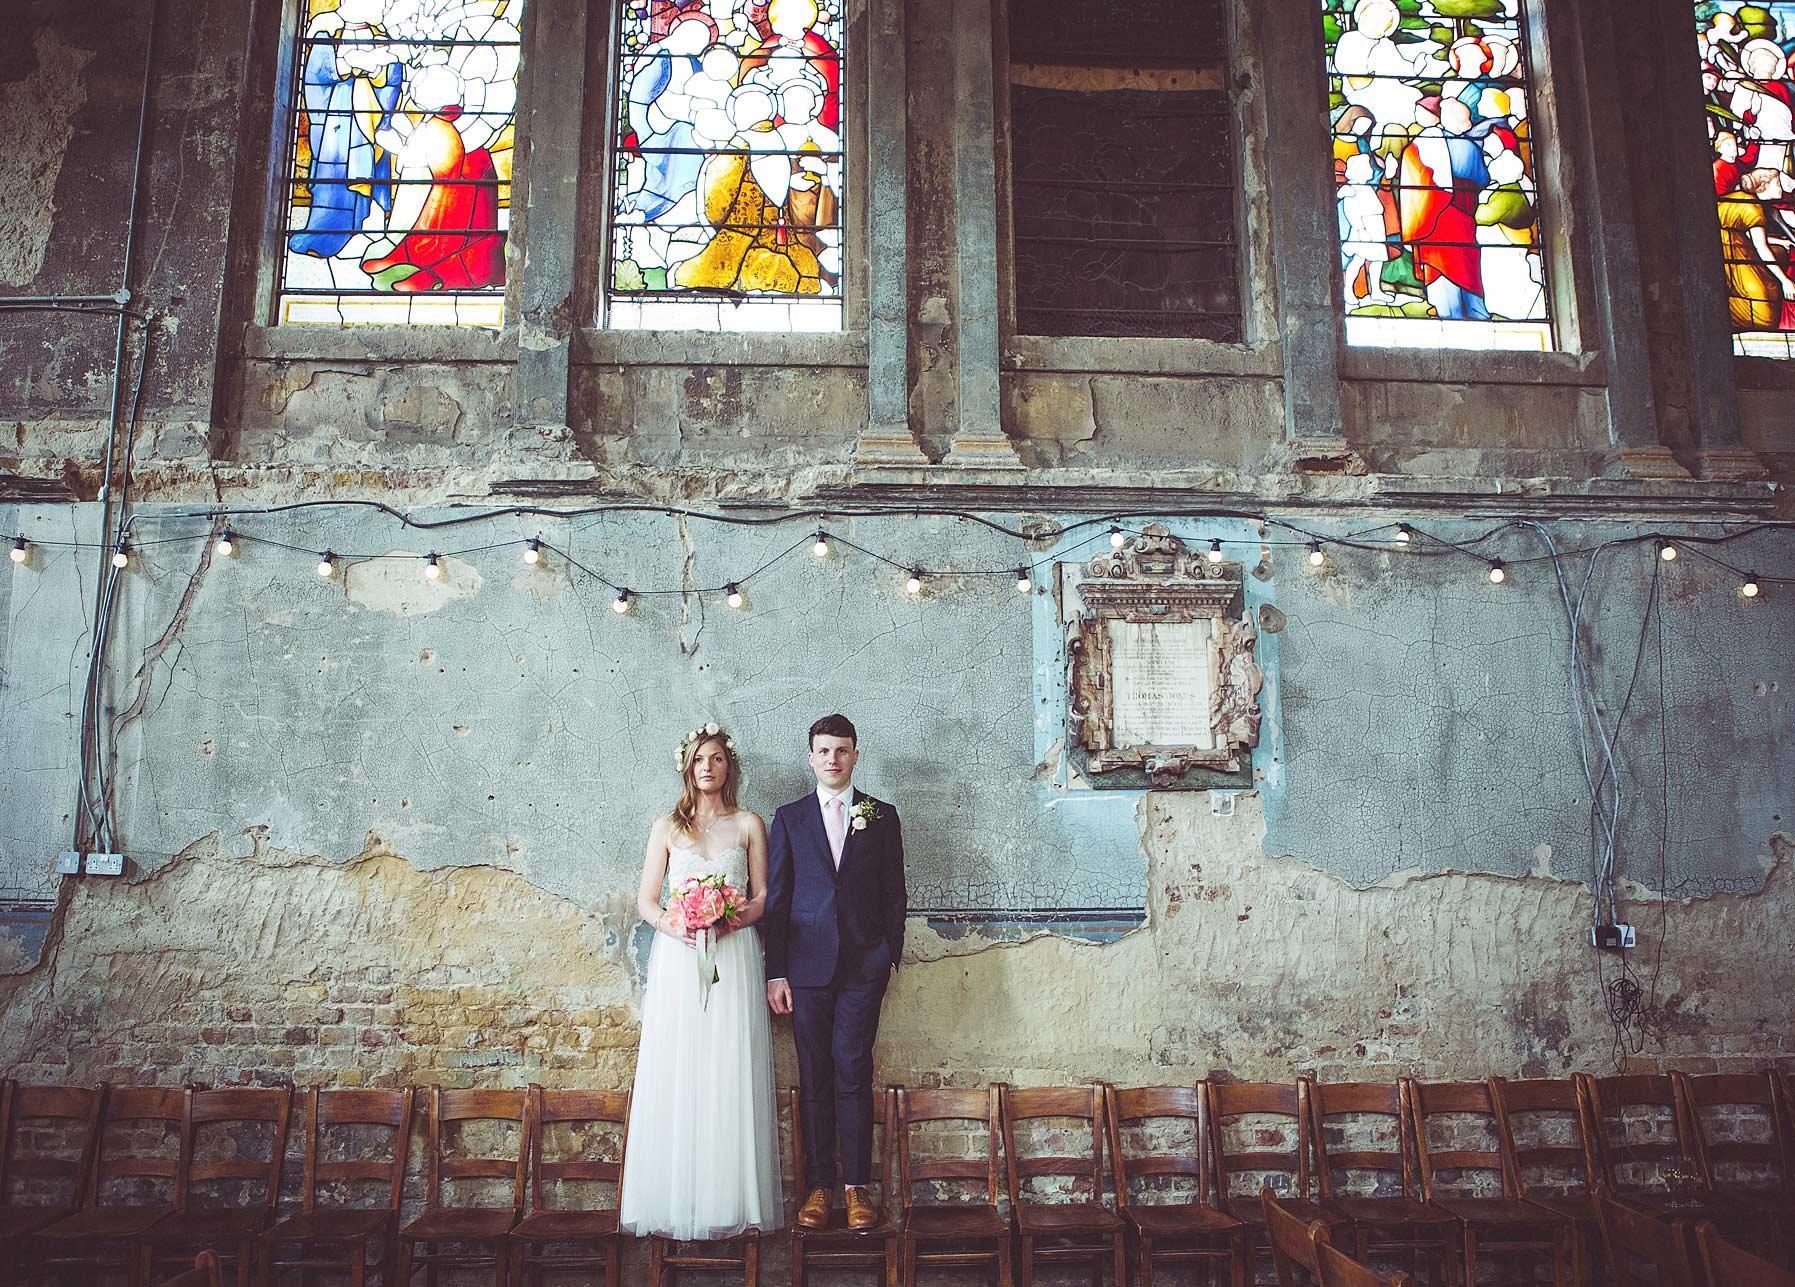 Wedding Photography at The Asylum , Peckham, London